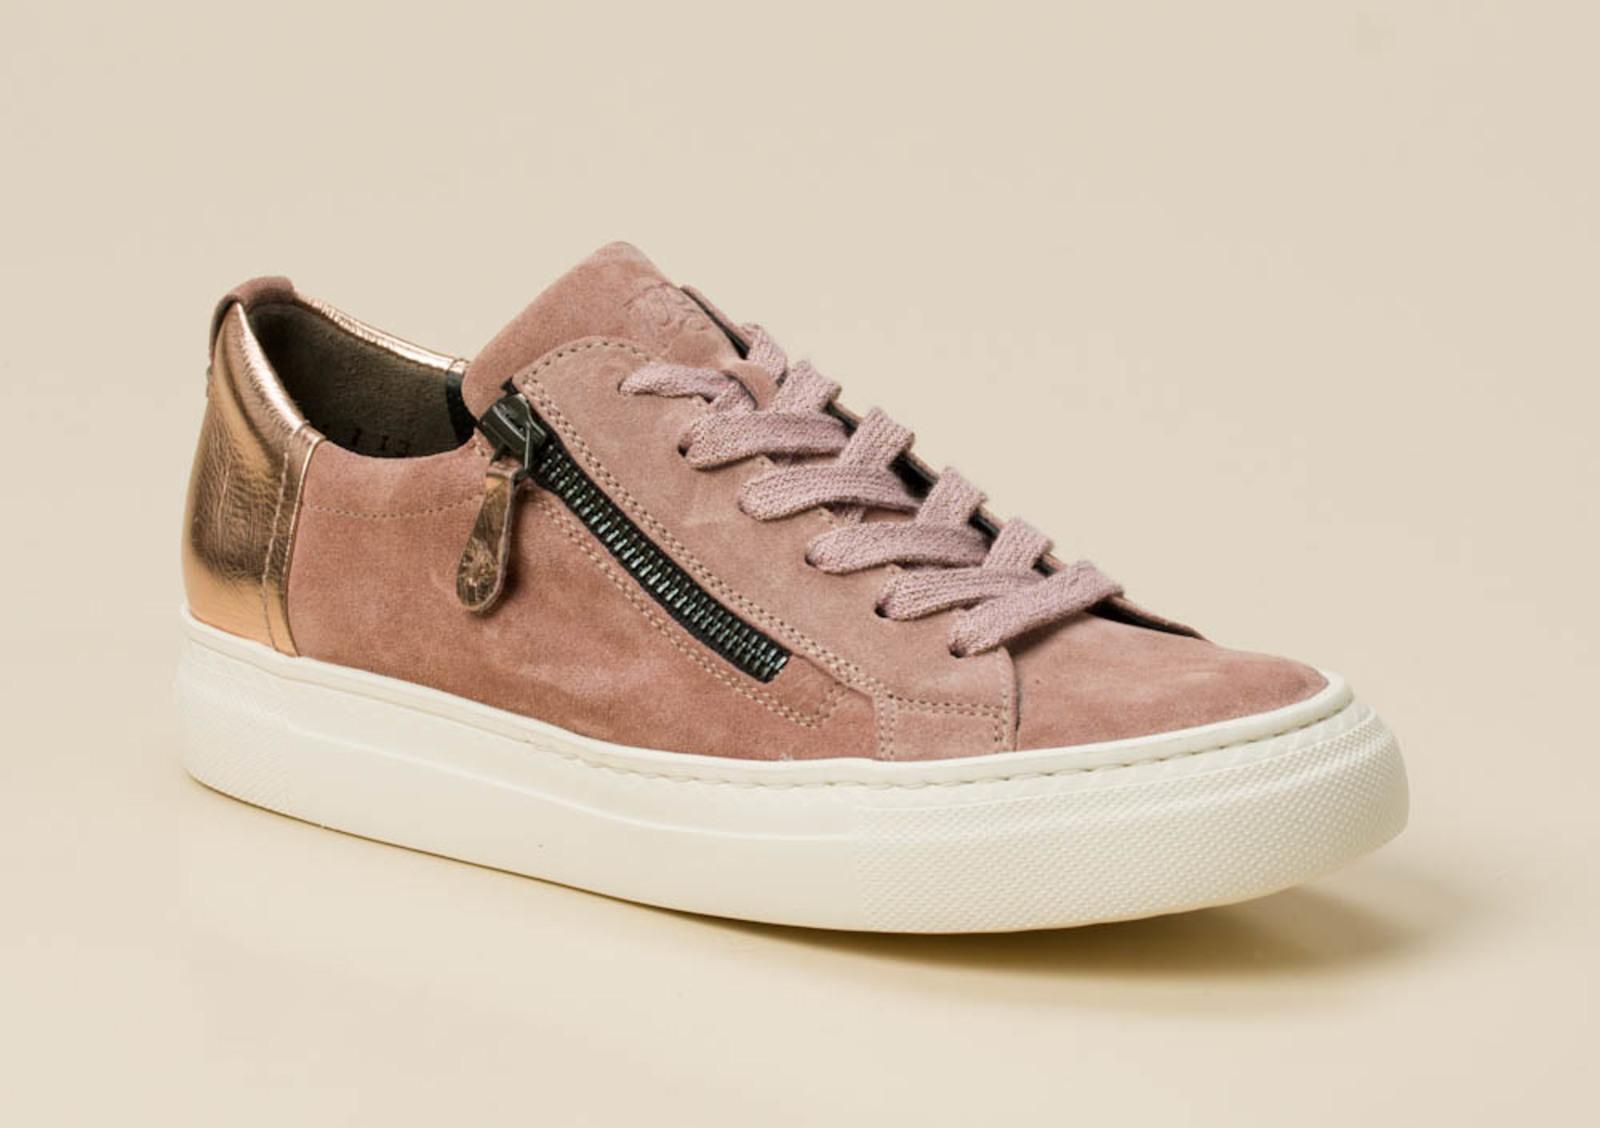 paul green damen sneaker in rosa altrosa kaufen zumnorde online shop. Black Bedroom Furniture Sets. Home Design Ideas